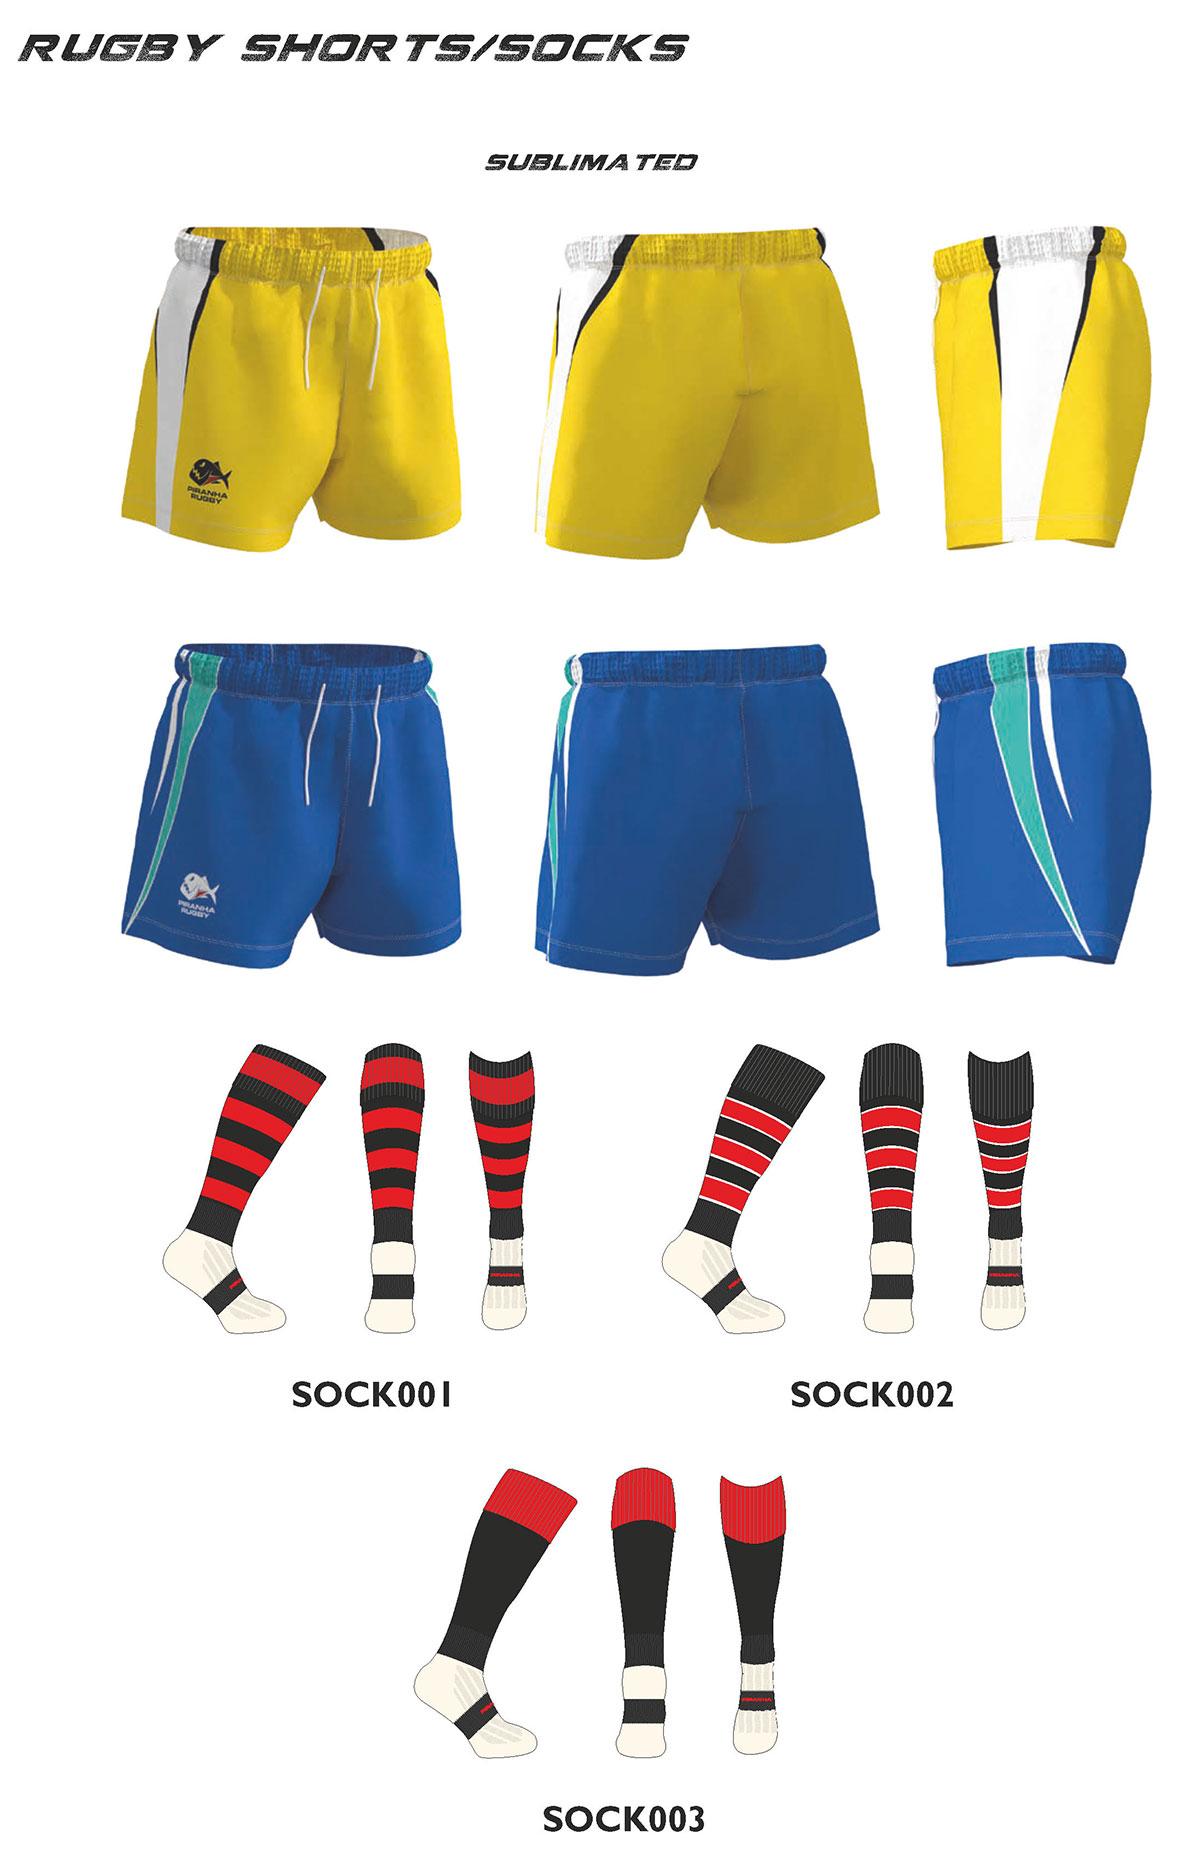 Piranha Rugby Shorts